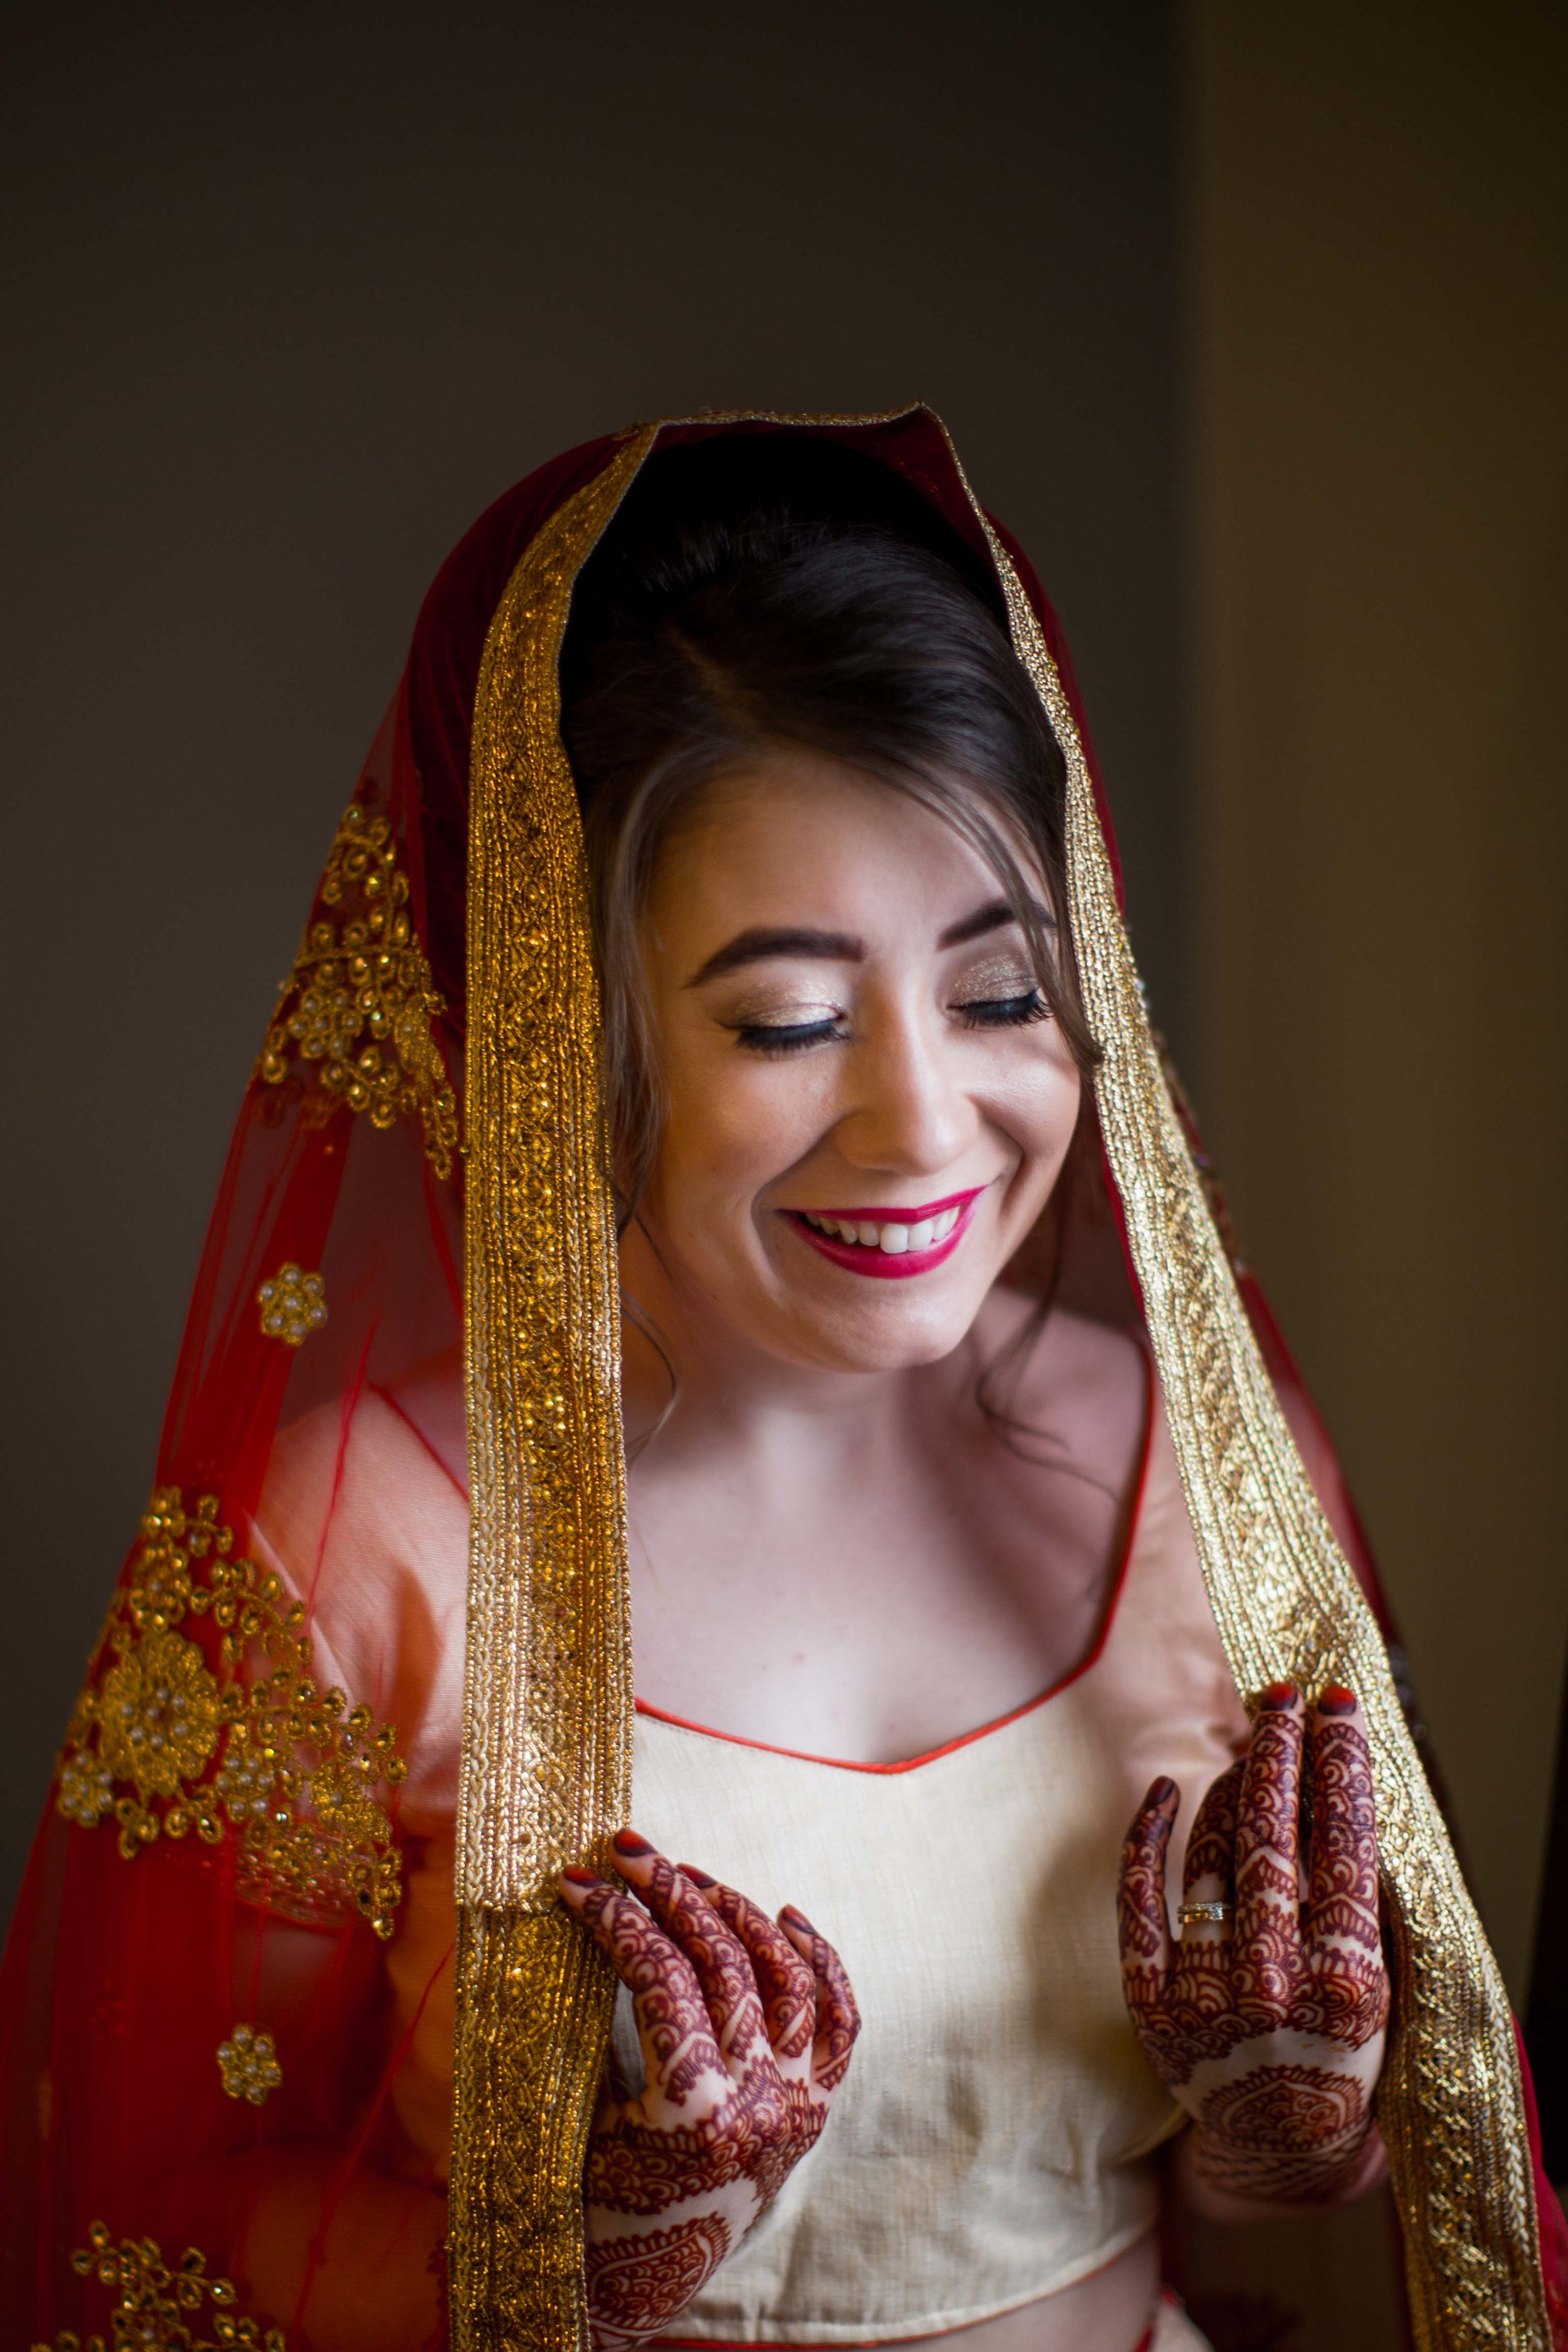 asian-Hindu-wedding-photographer-london-natalia-smith-photography-bride-dupatta-8.jpg